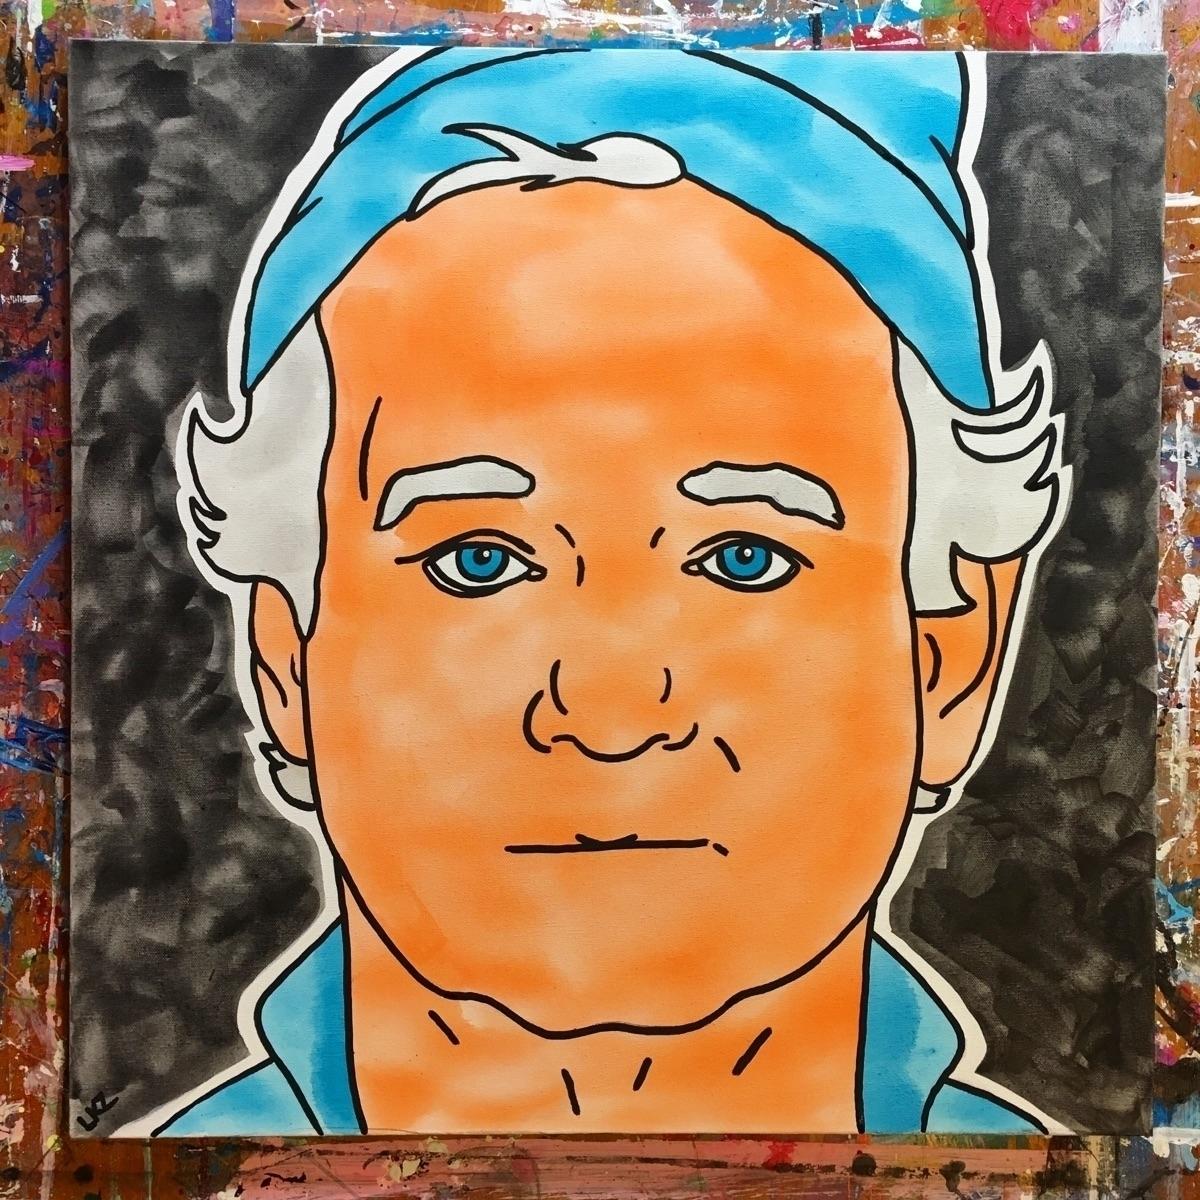 Bill Murray acrylic - 24 - billmurray - lizkellyzook | ello